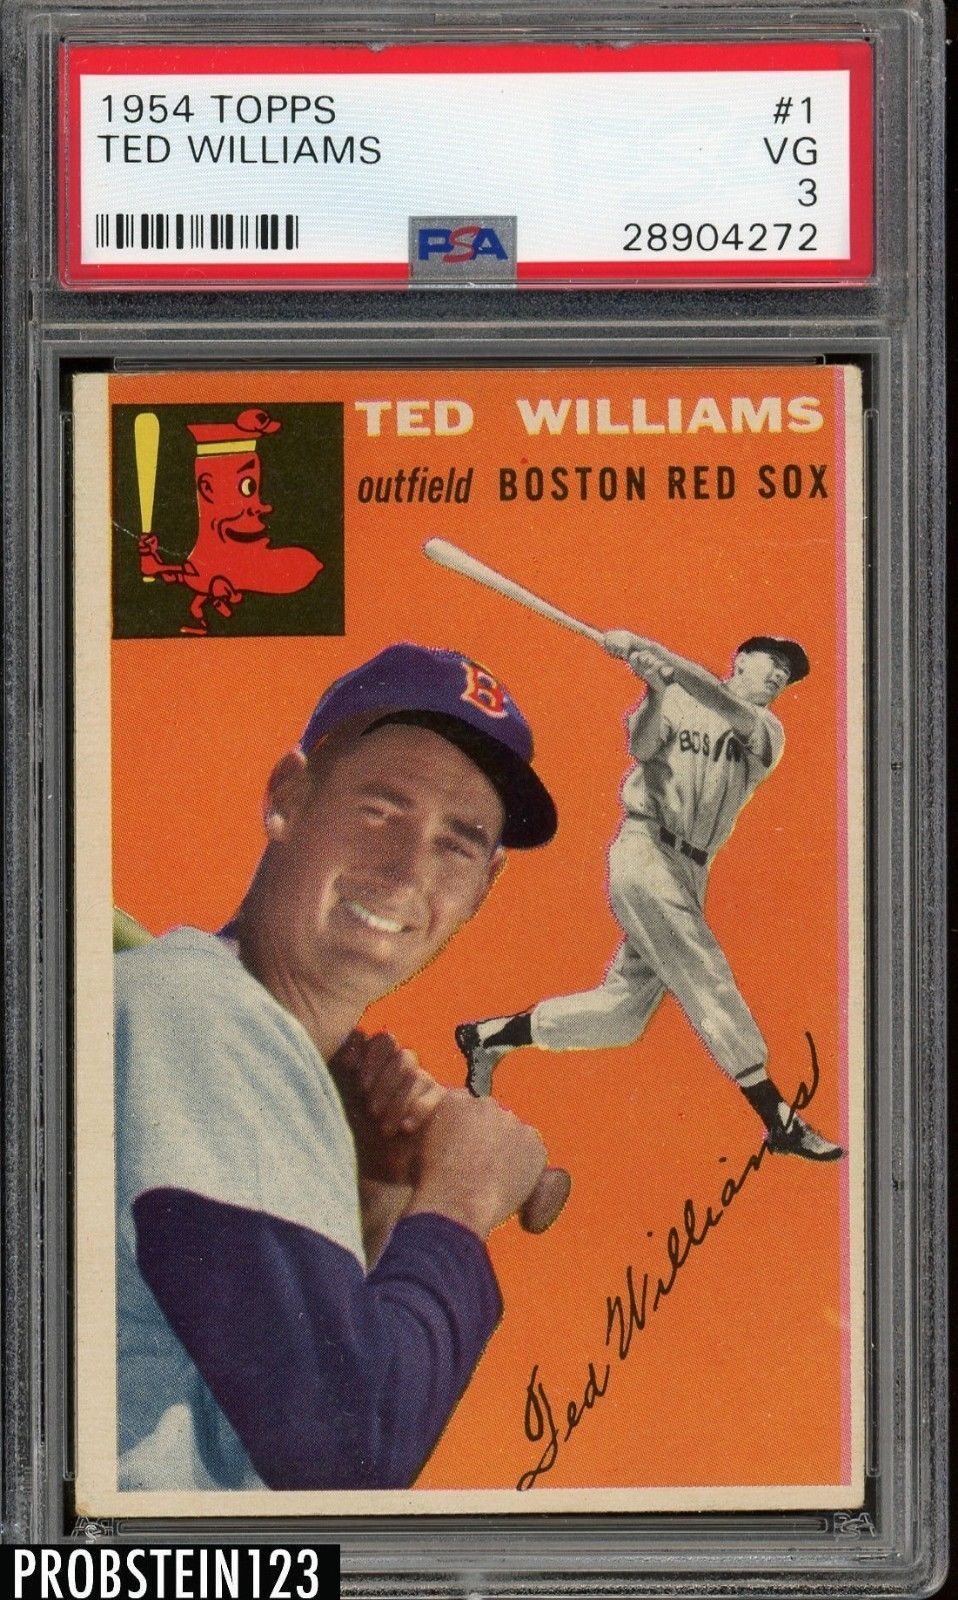 1954 topps 1 ted williams red sox hof psa 3 vg